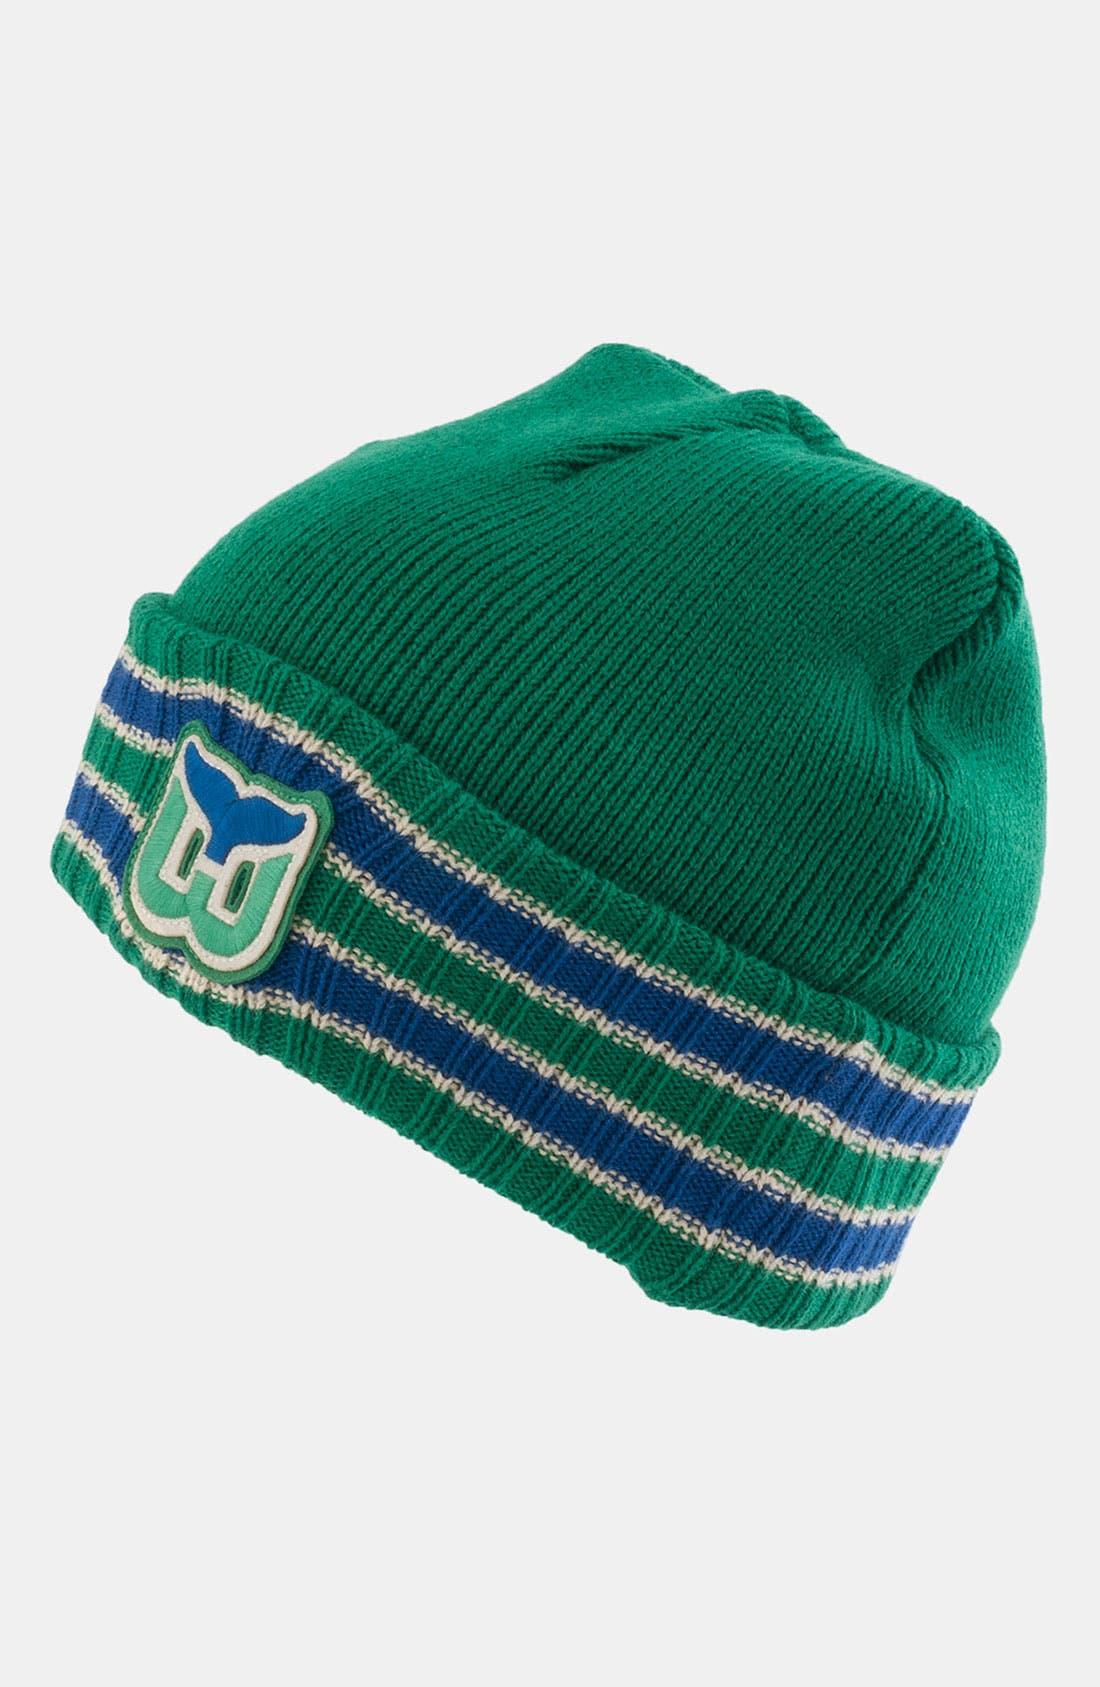 Alternate Image 1 Selected - American Needle 'Hartford Whalers - Slash' Knit Hat